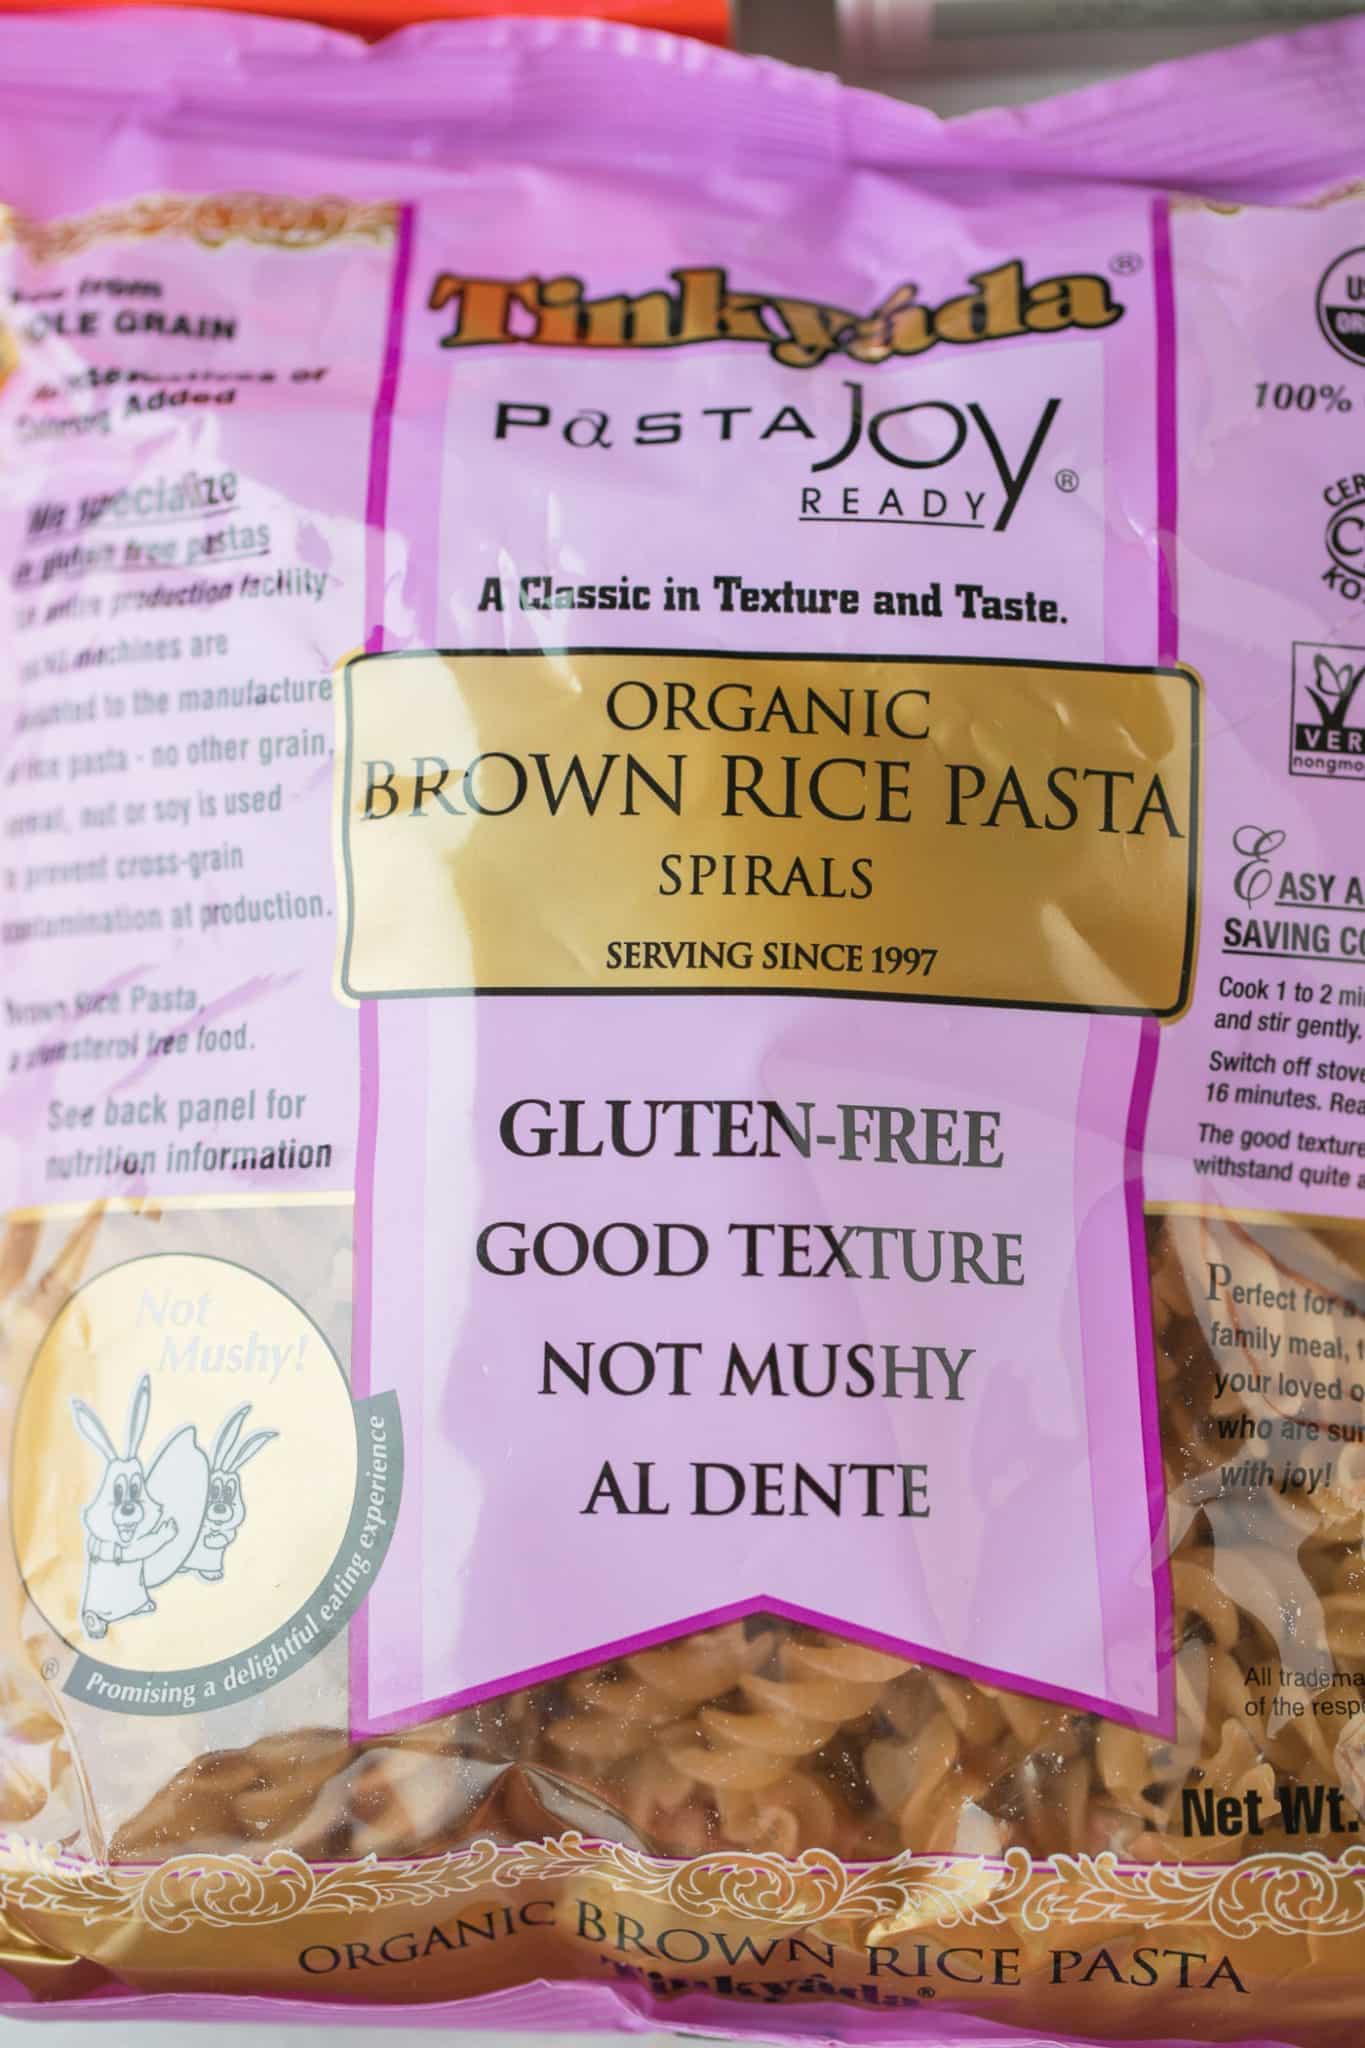 bag of Tinkyada brown rice spiral pasta